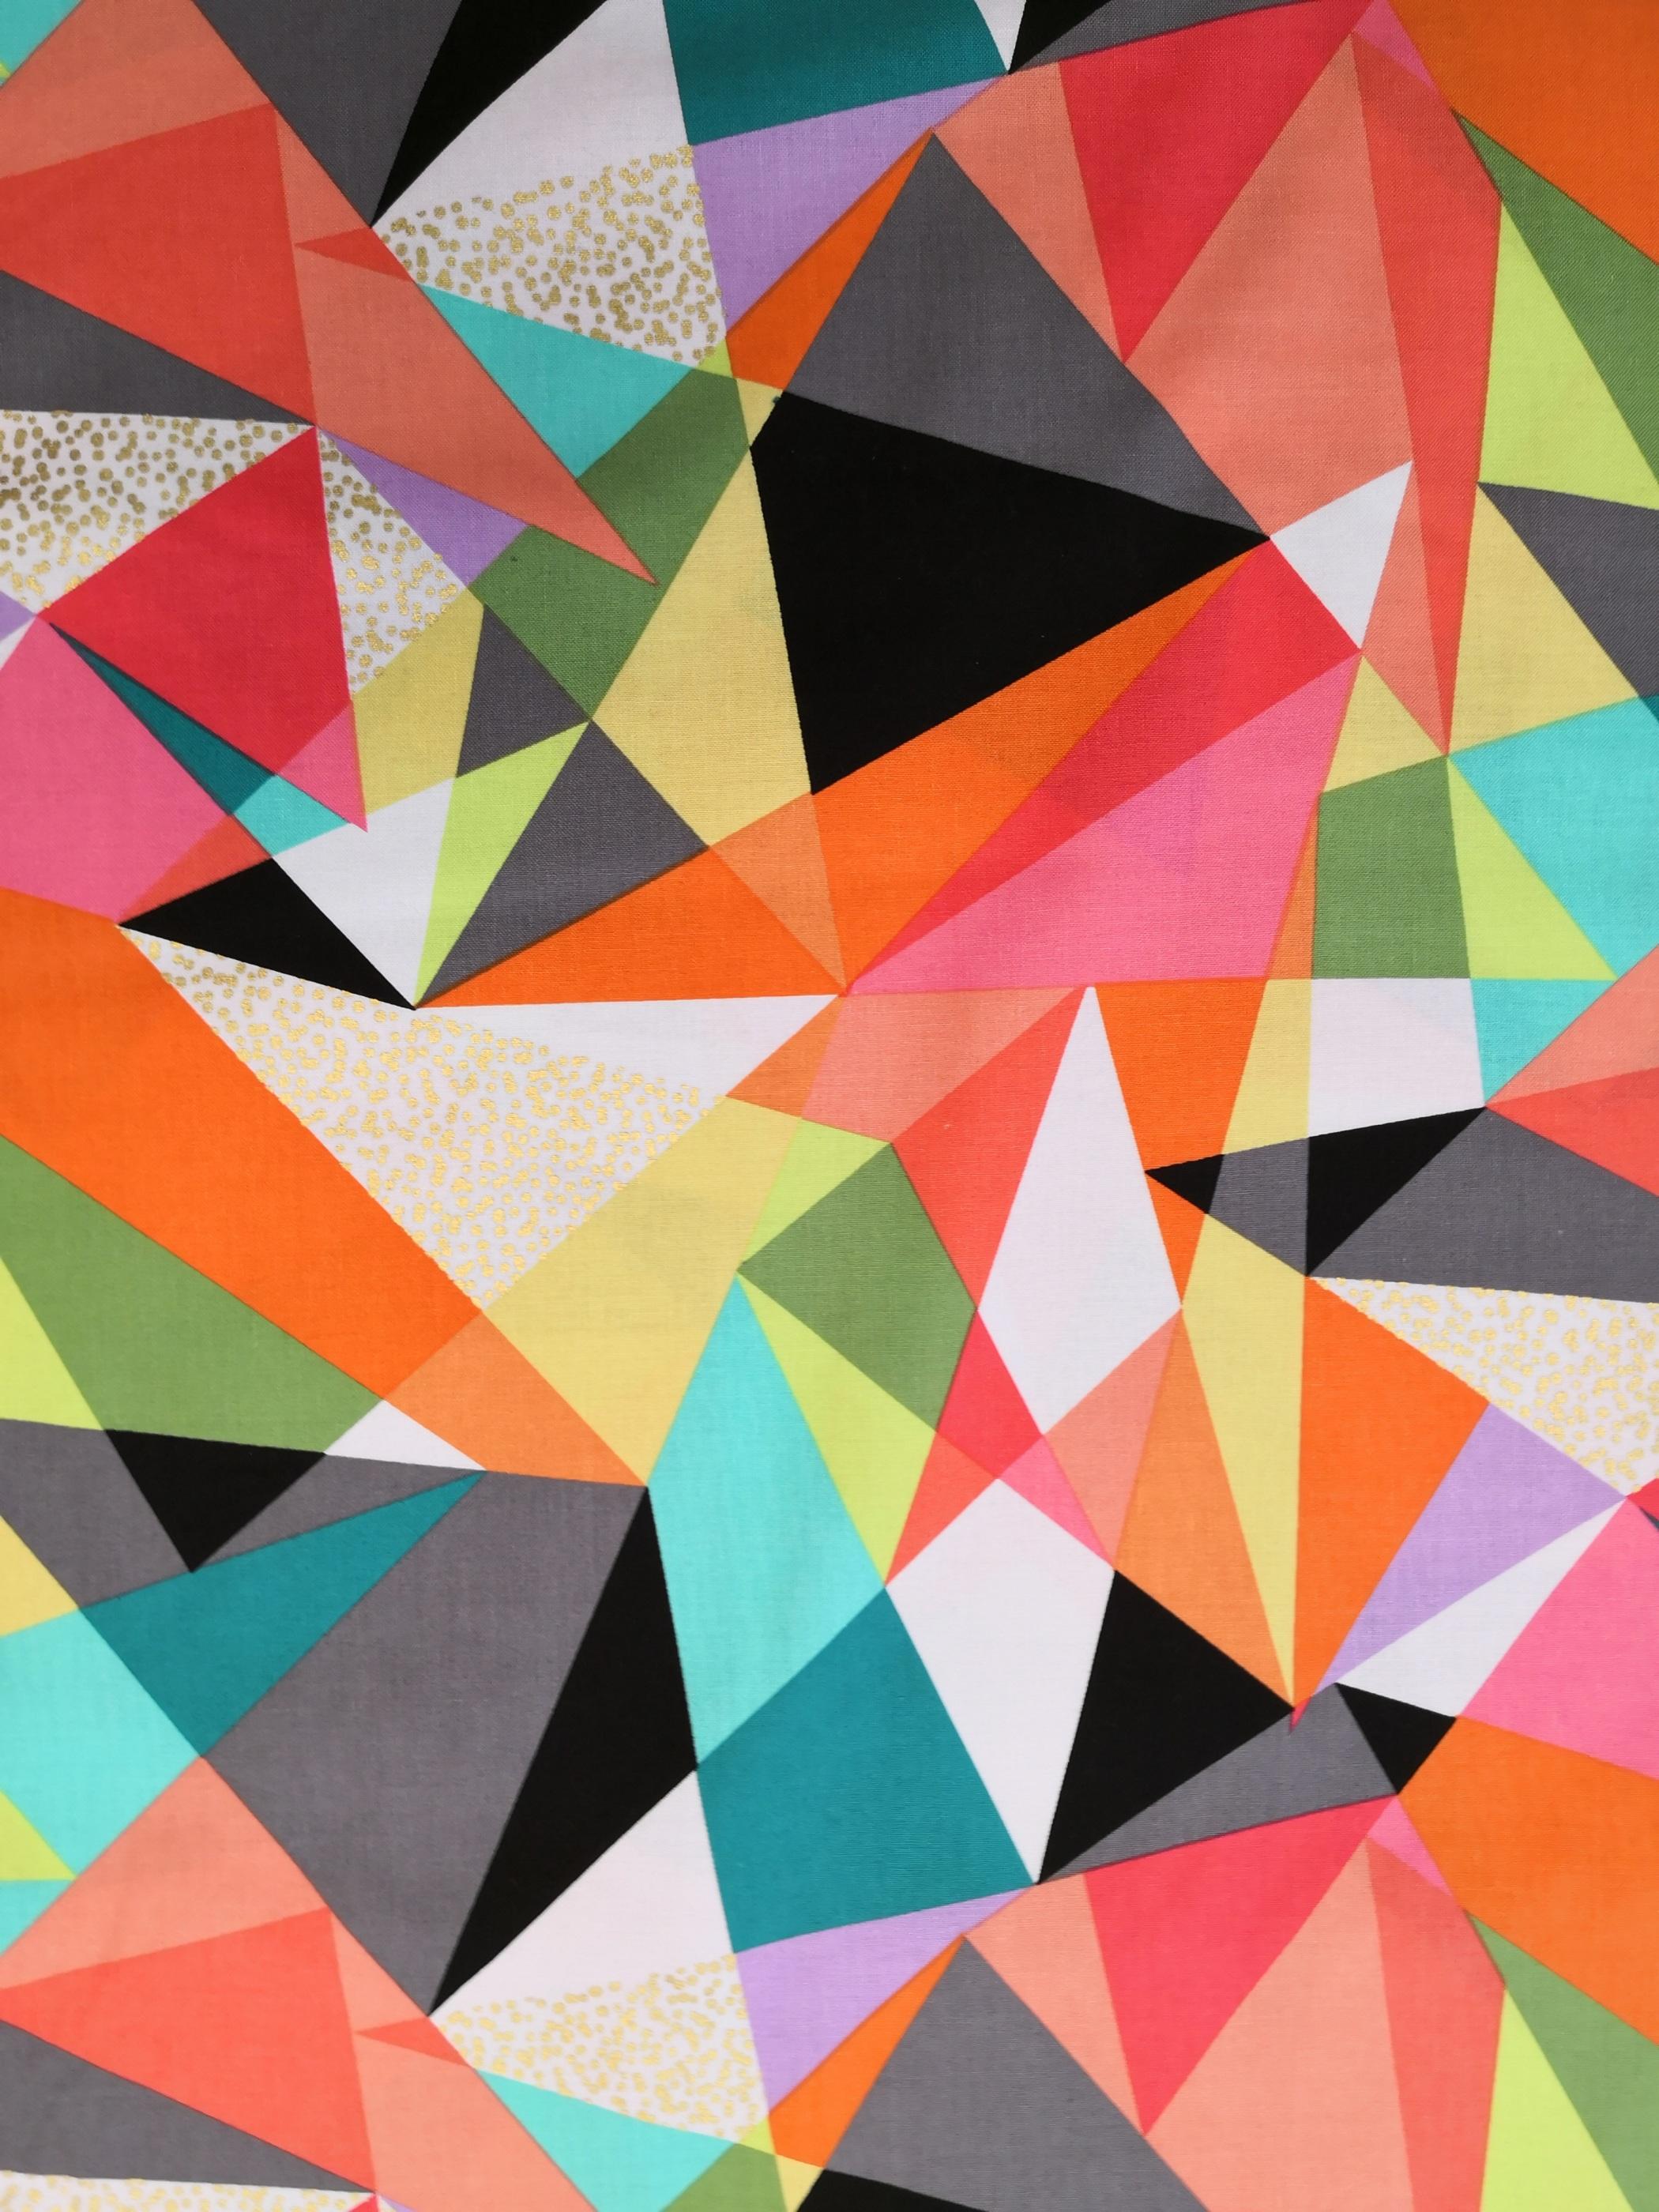 Trekanter, metervara, tyg, tyglust, mönster, form, färger